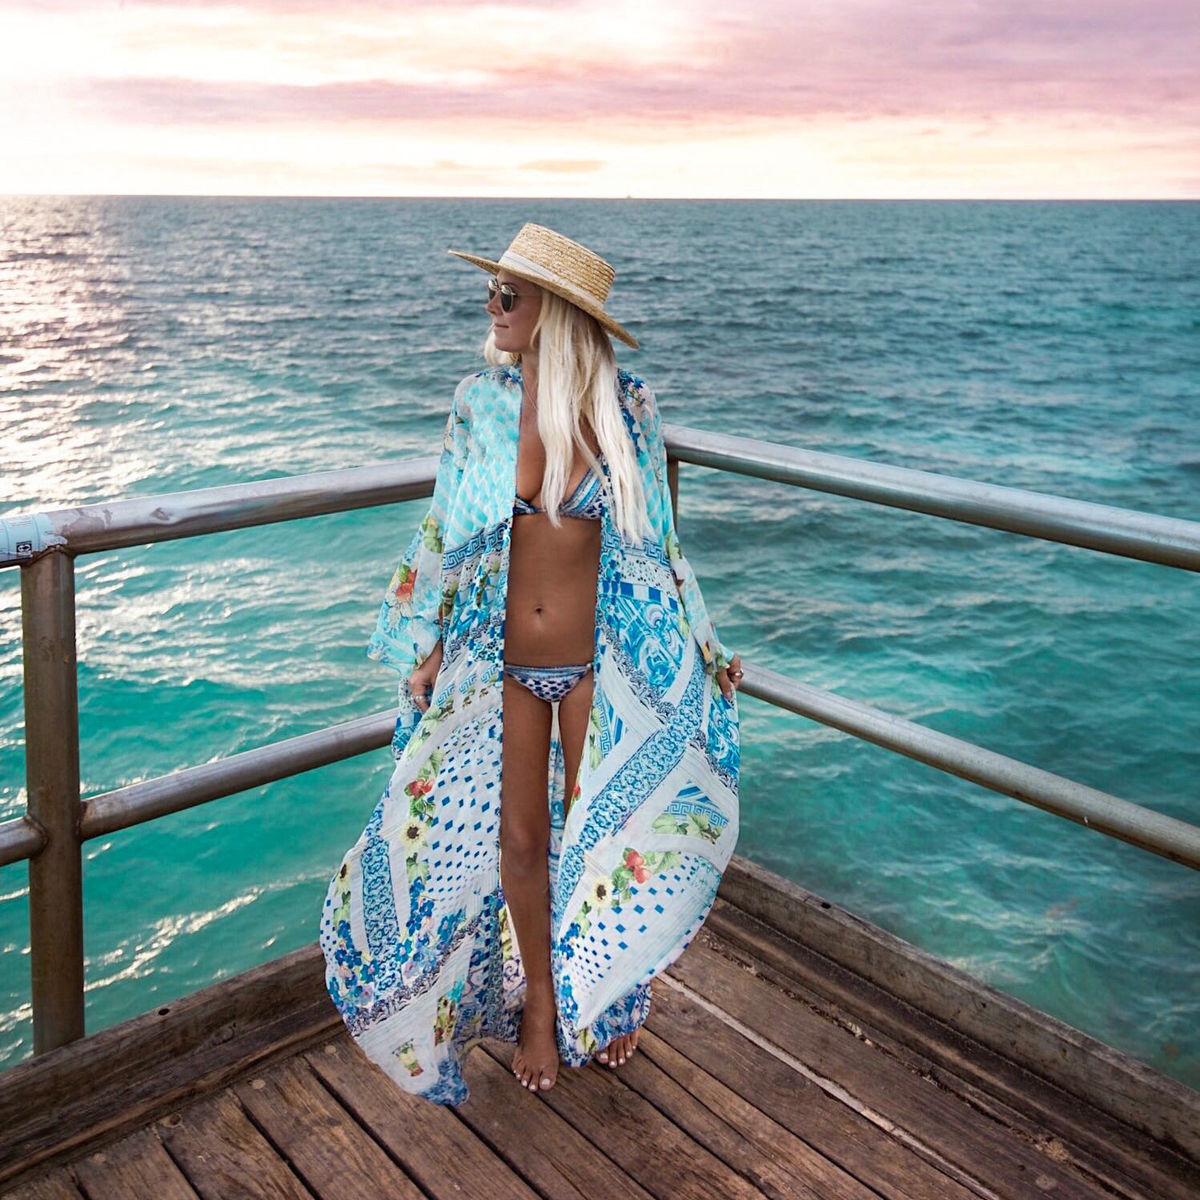 Womens Boho Style Beach Summer Tops Chiffon Striped Floral Long Kimono Cardigans Femme Harajuku Blusa Feminina Dames Ropa Mujer